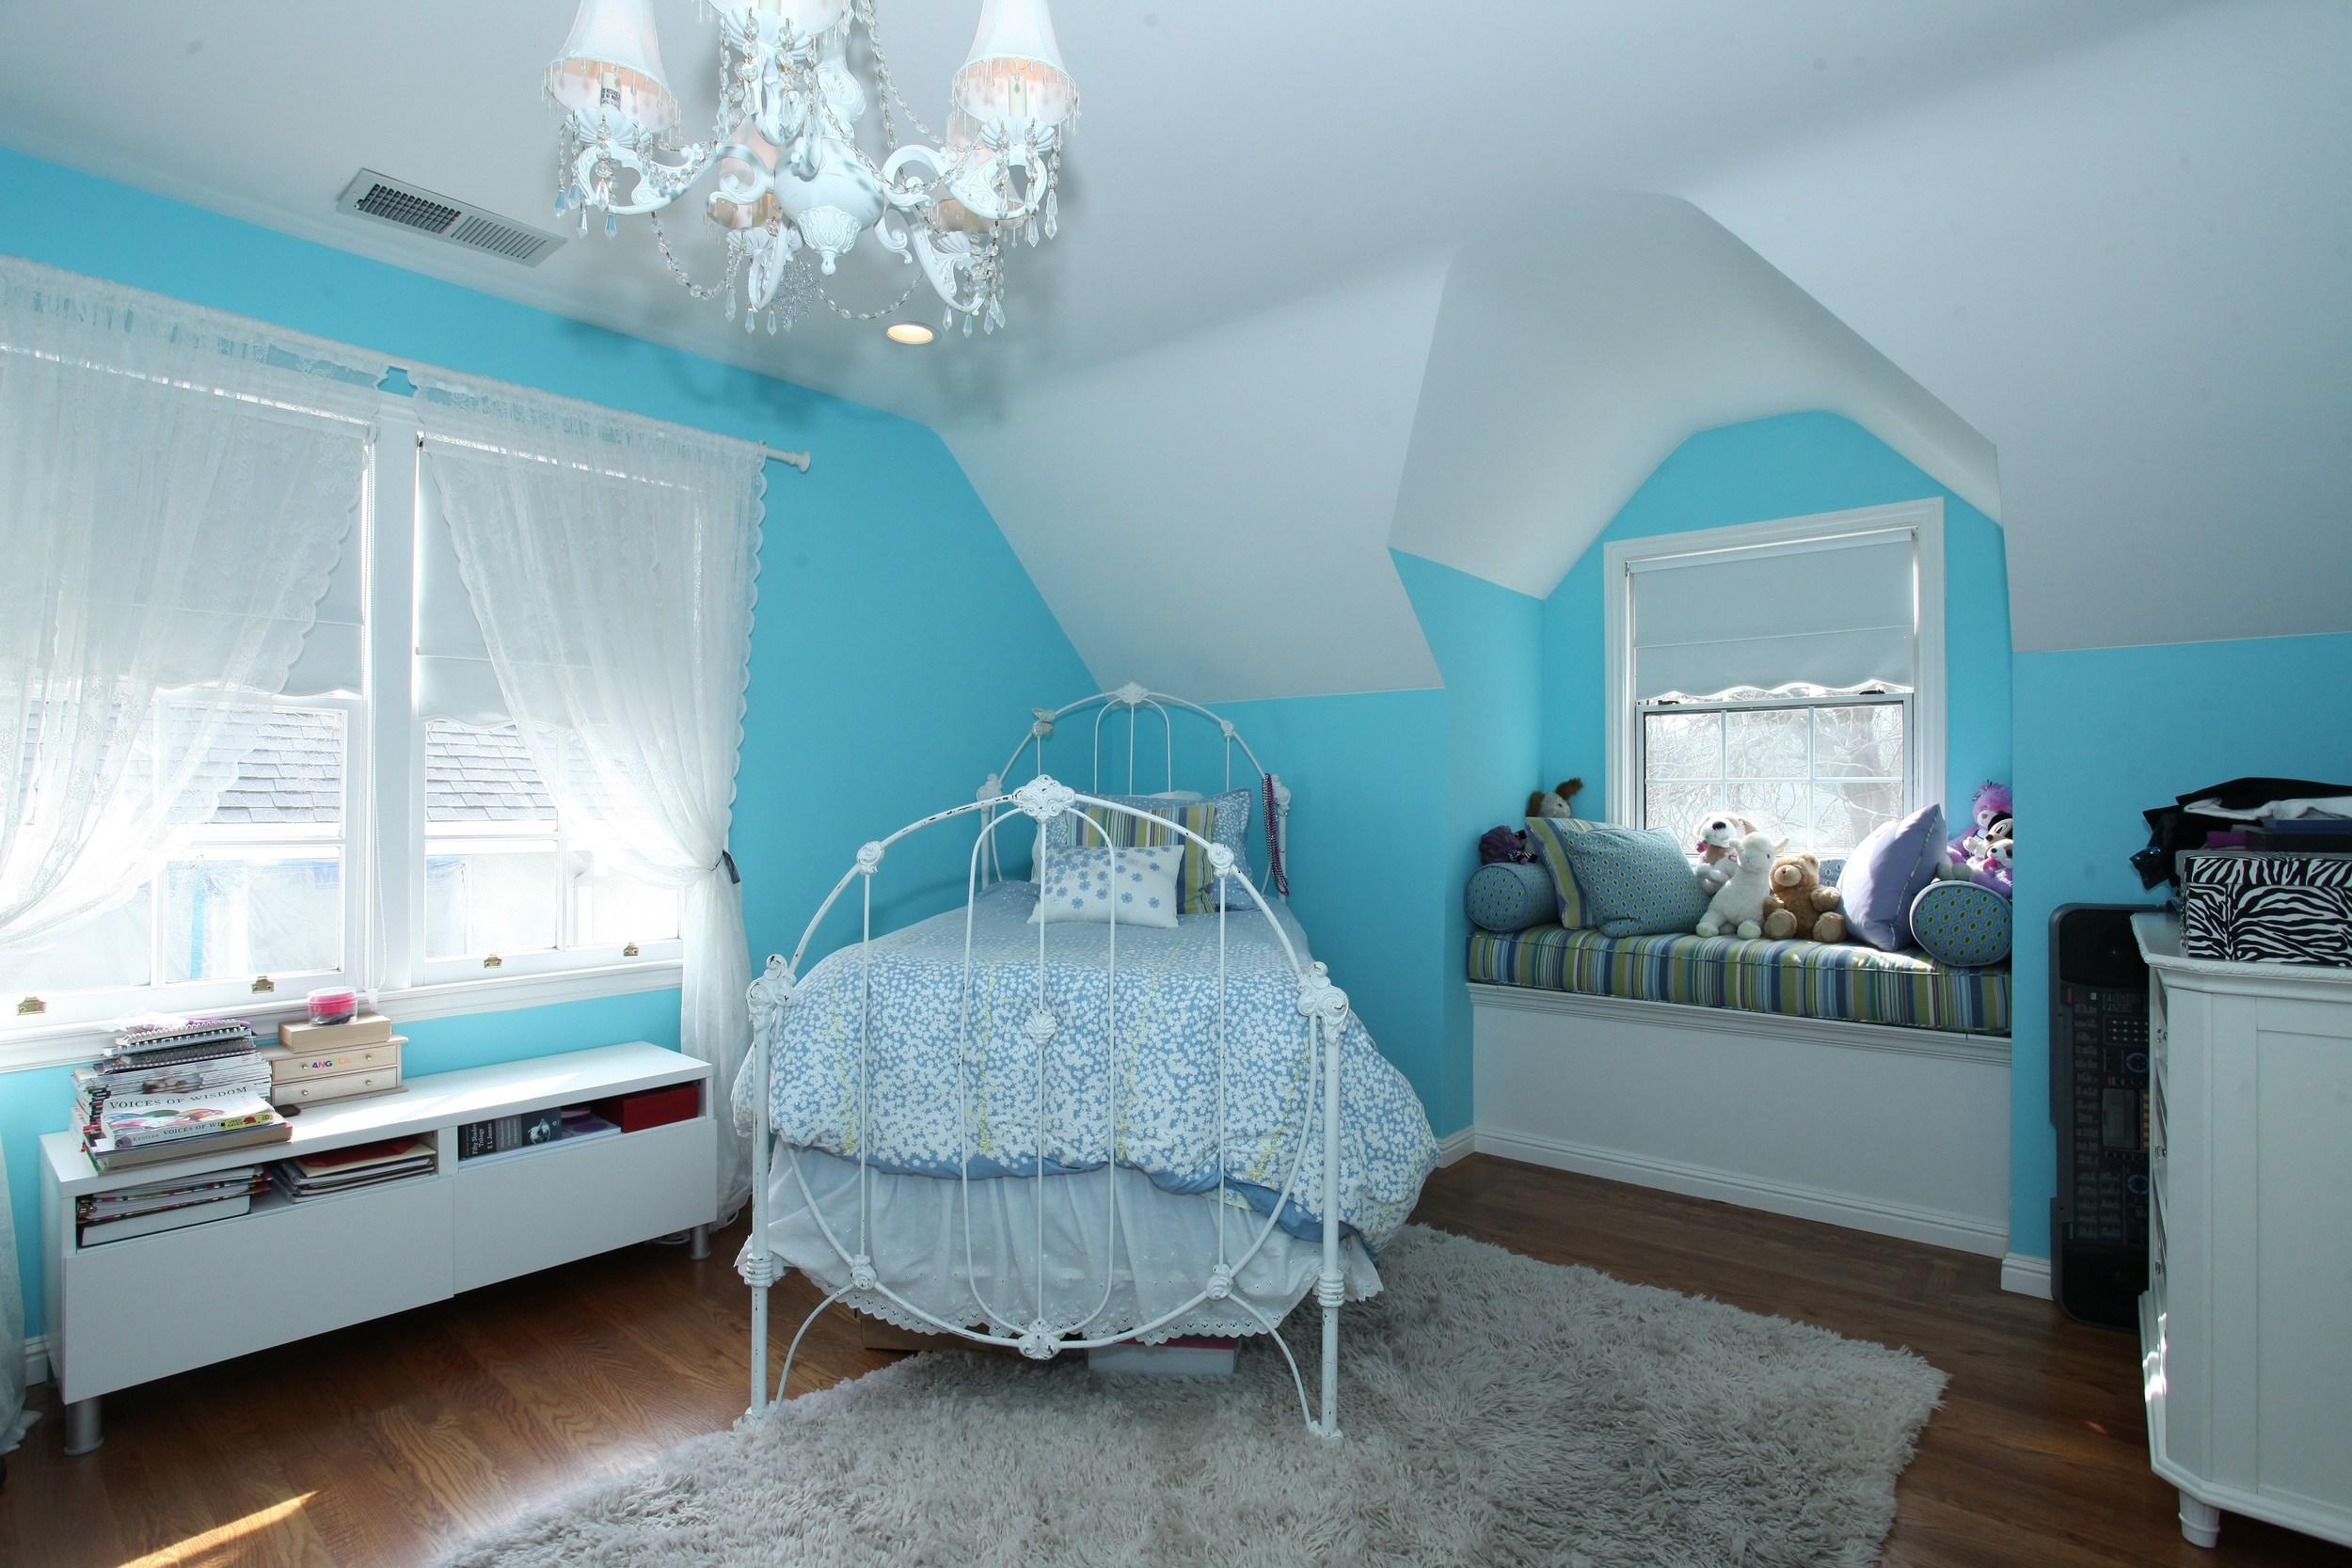 014_Bedroom 2.jpg